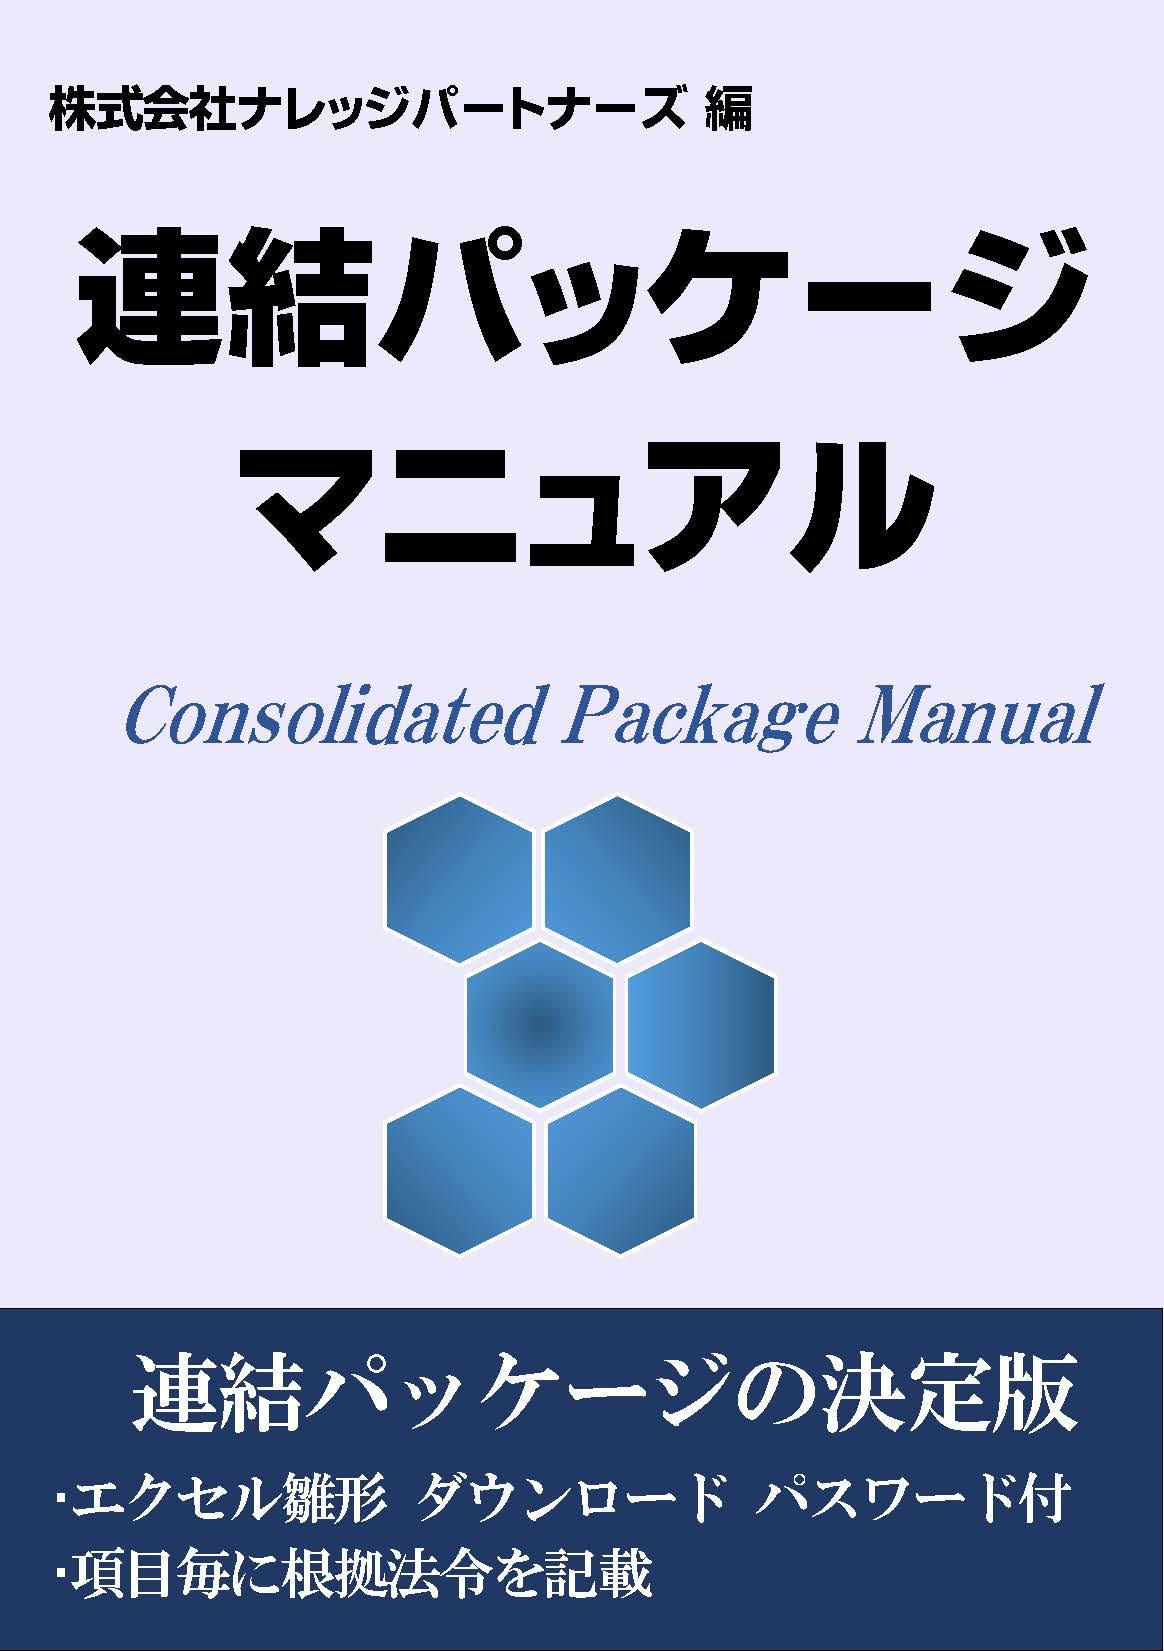 cover_連結パッケージマニュアル